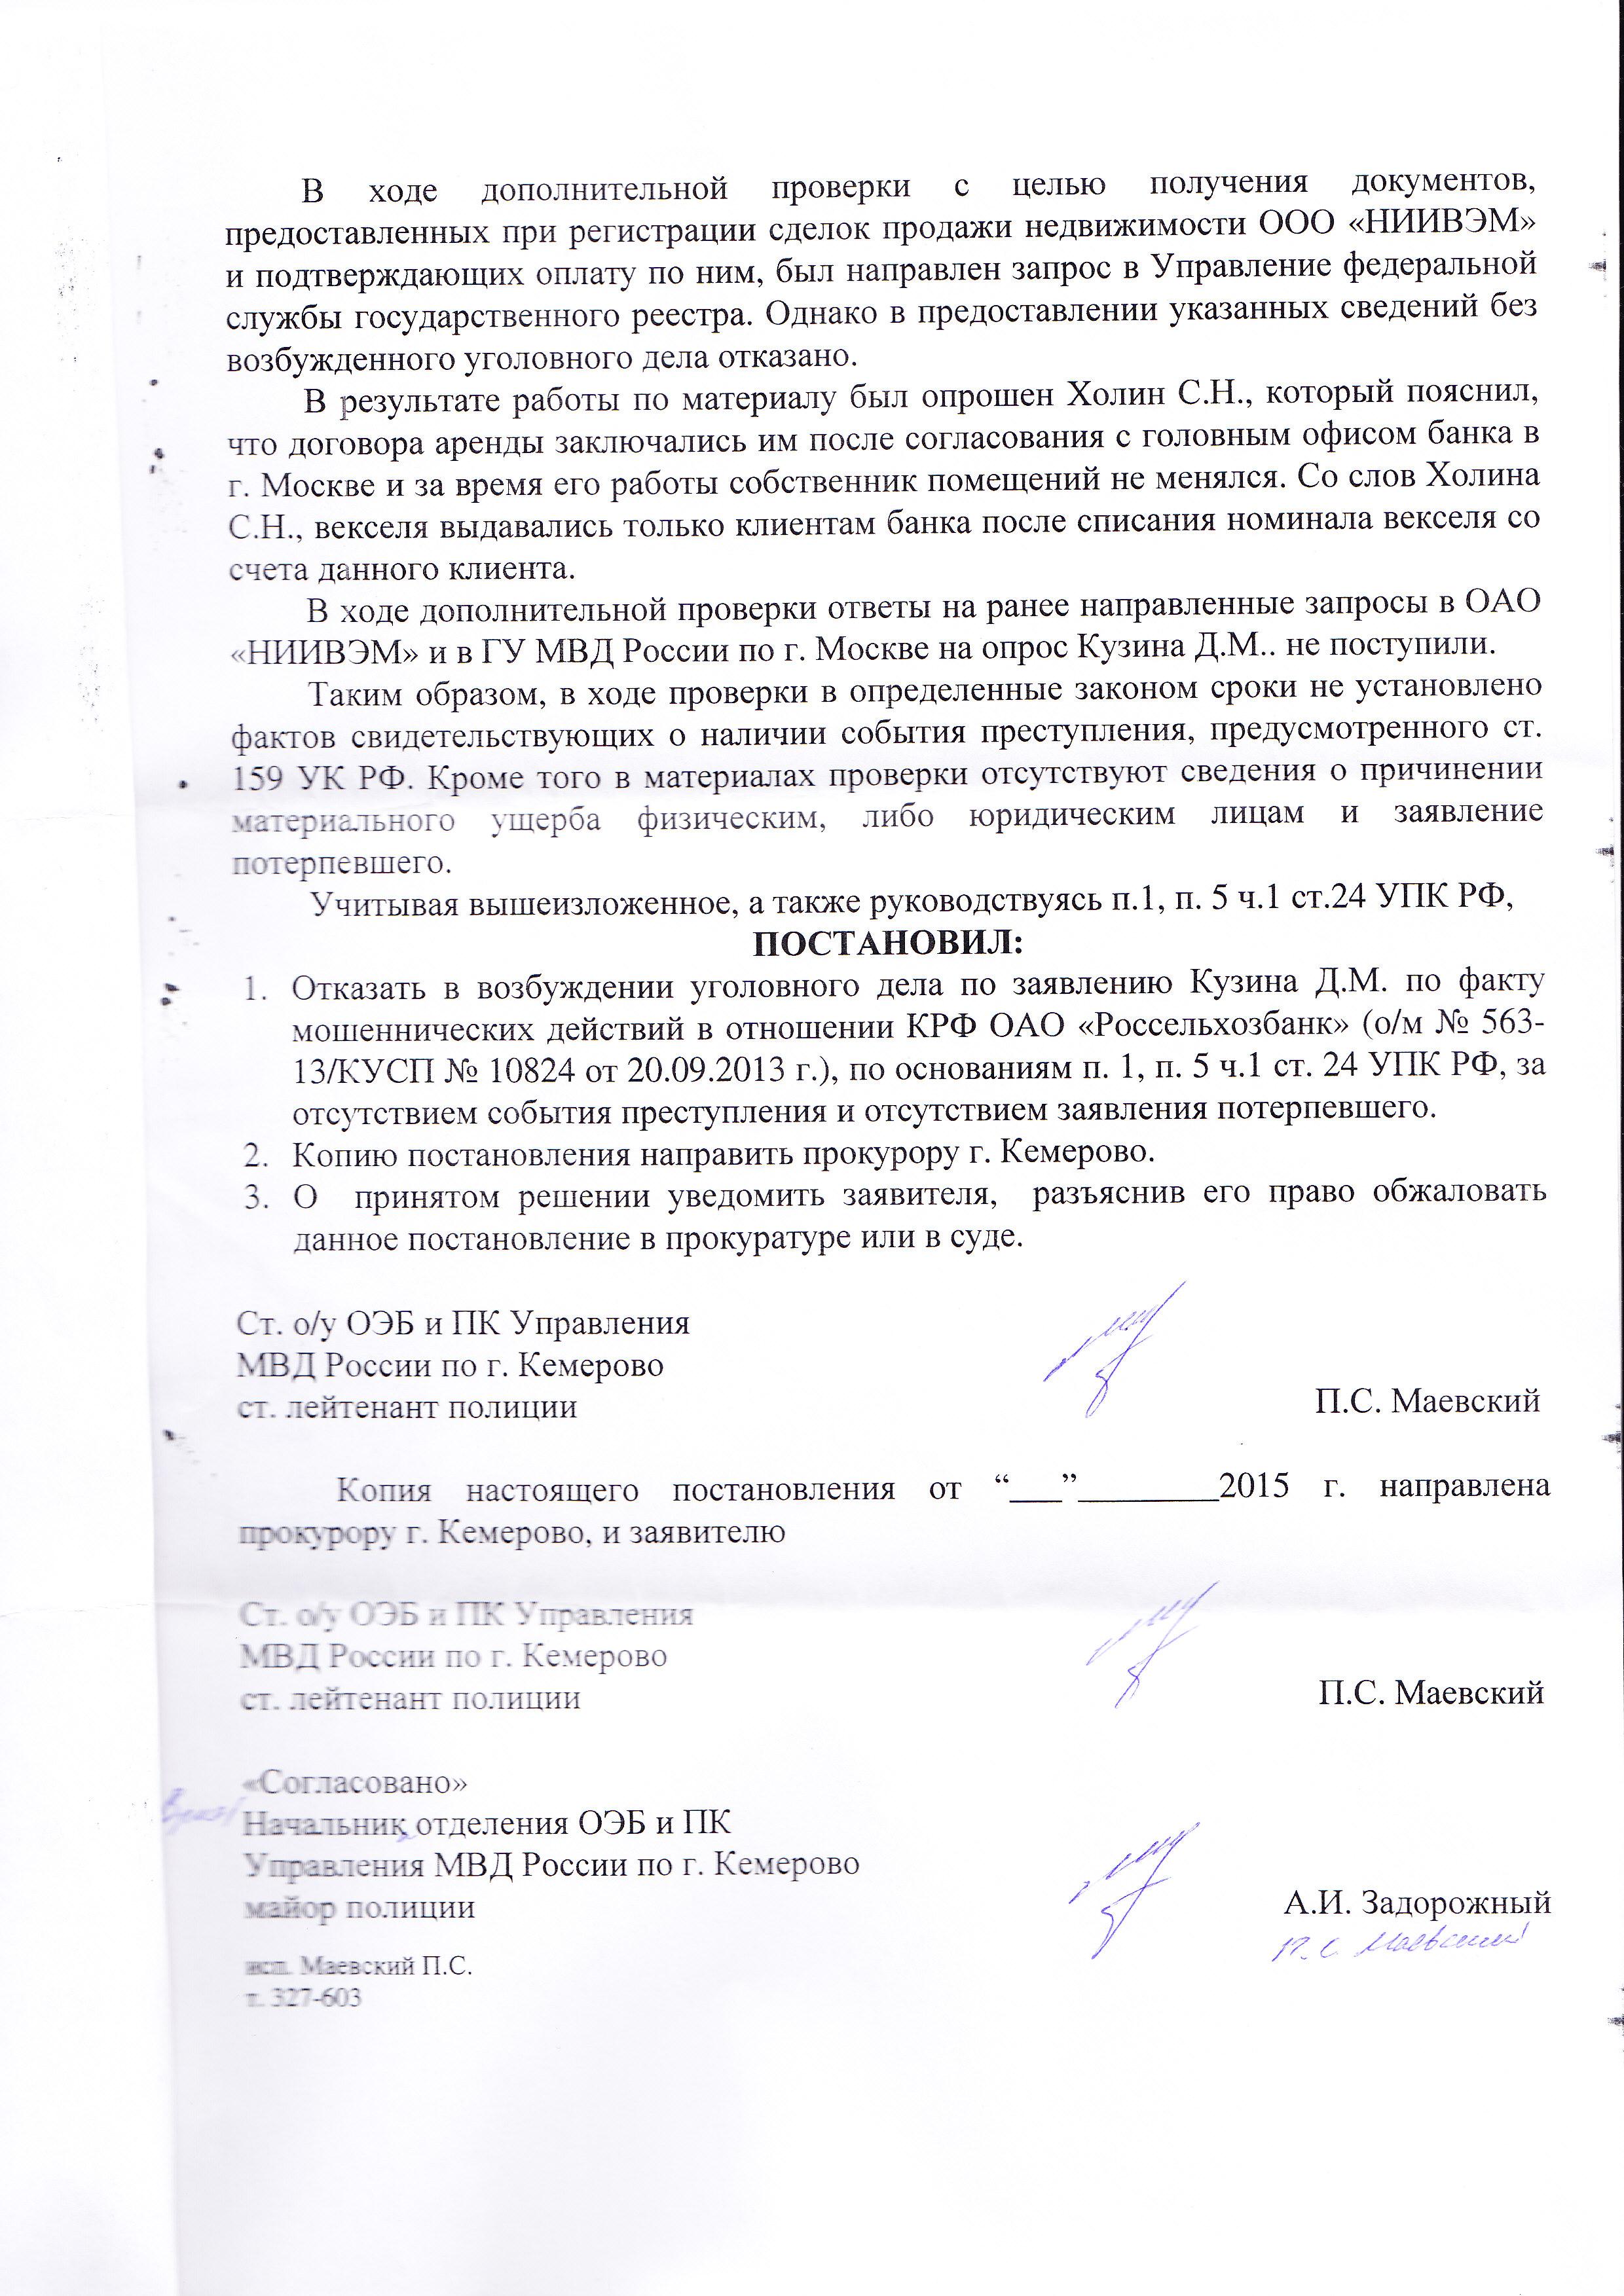 Постановление УВД Кемерова от 04 05 2015 - 2 л